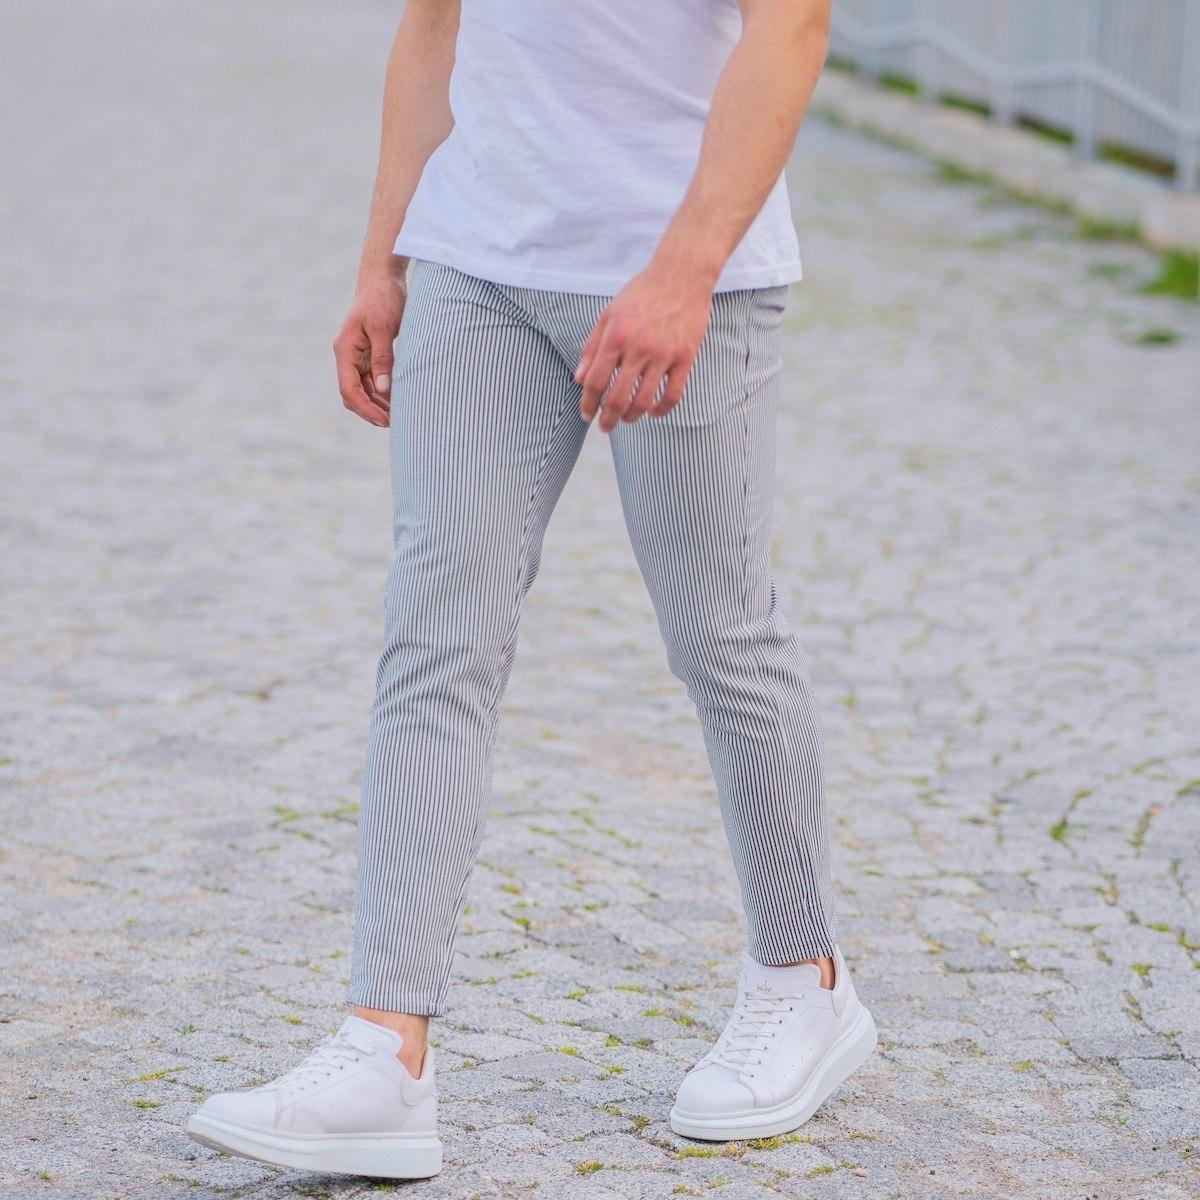 Men's Slim Fit Lycra Sport Pants With Thin Stripes White